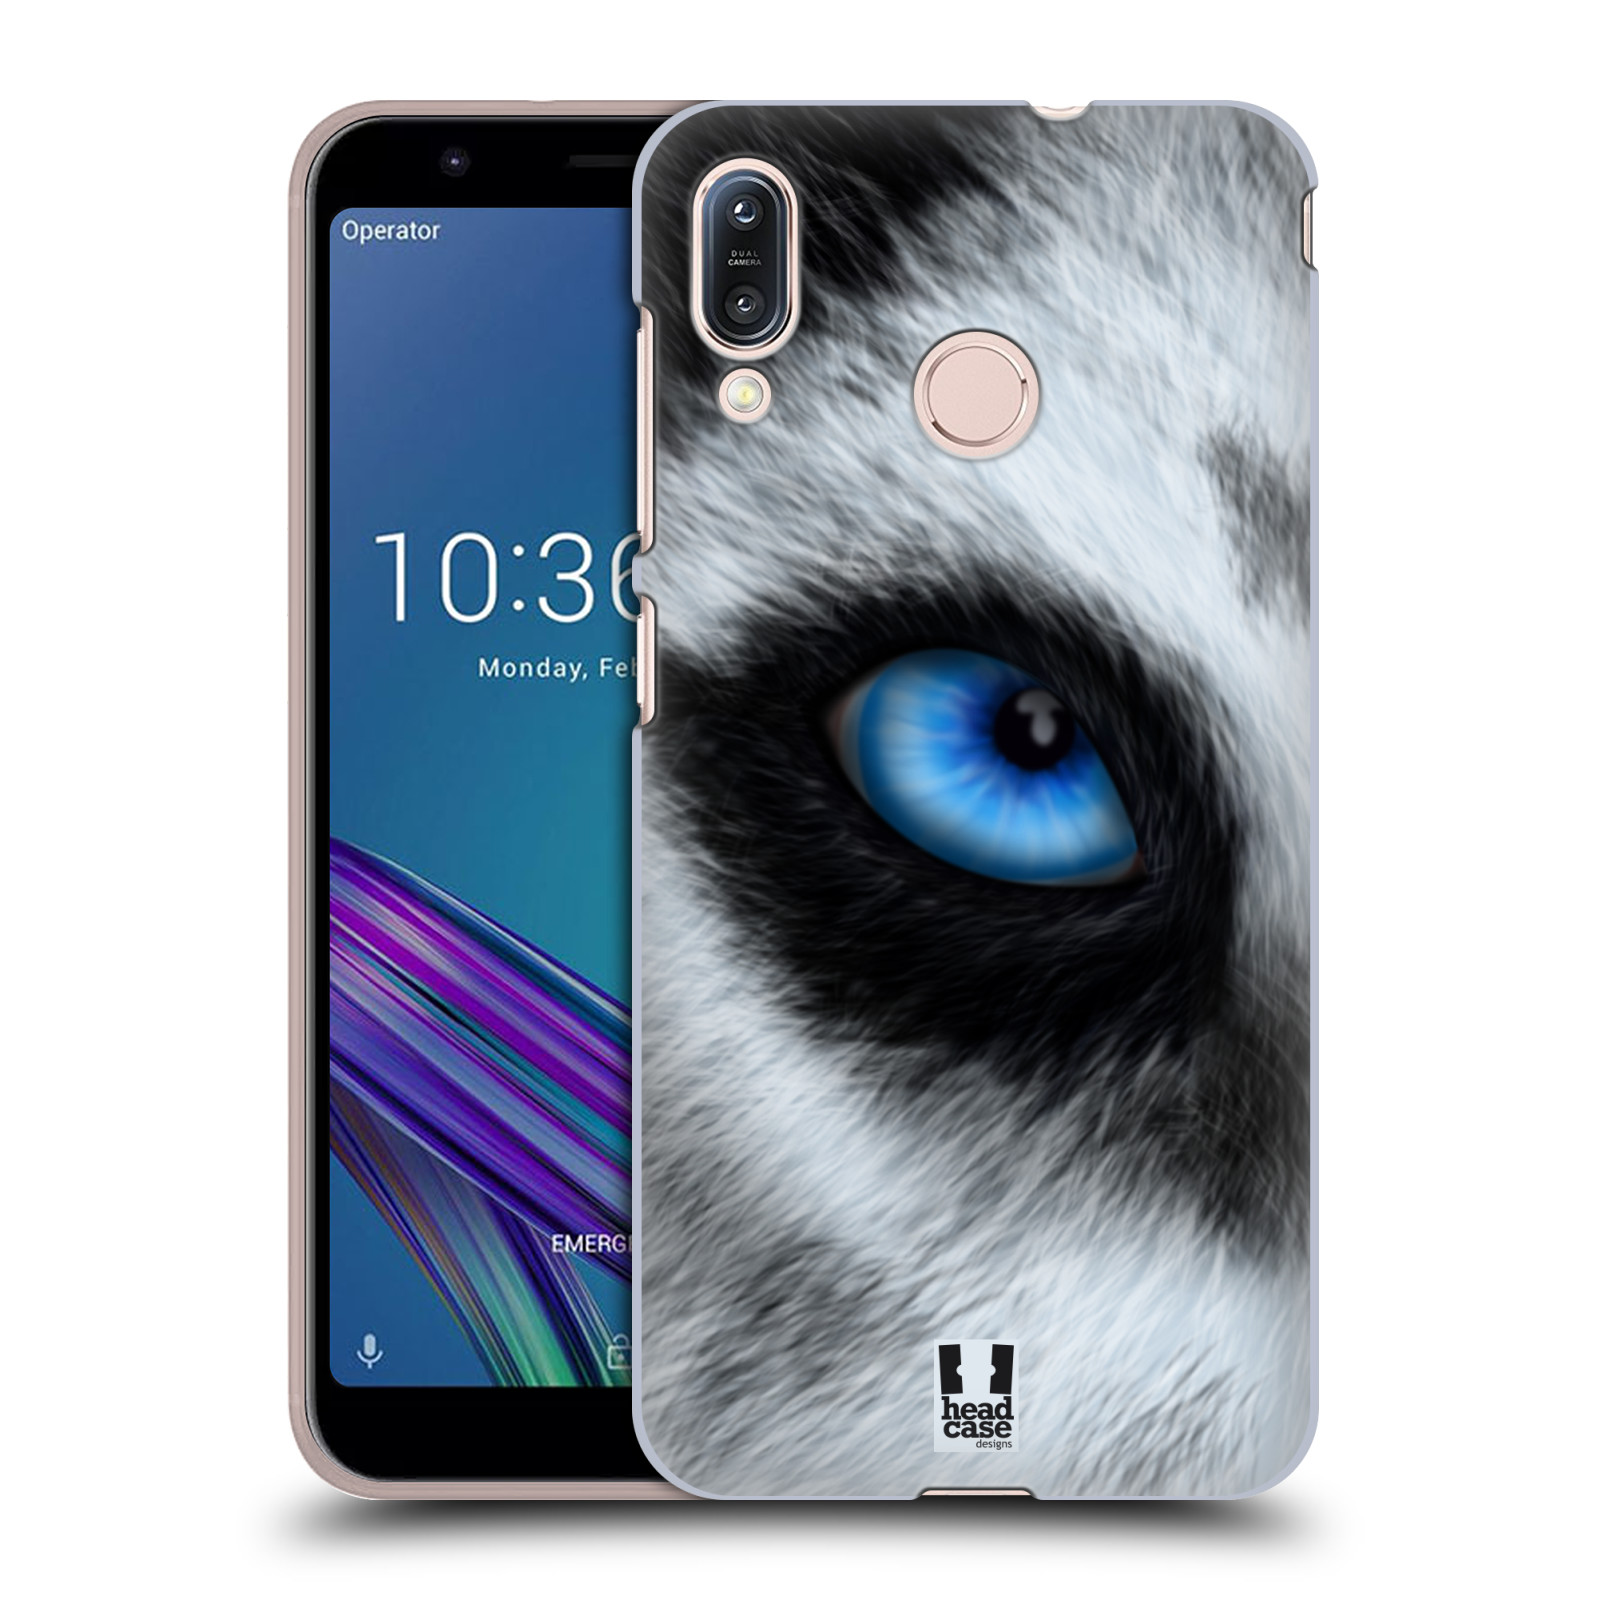 Pouzdro na mobil Asus Zenfone Max M1 (ZB555KL) - HEAD CASE - vzor pohled zvířete oko pes husky